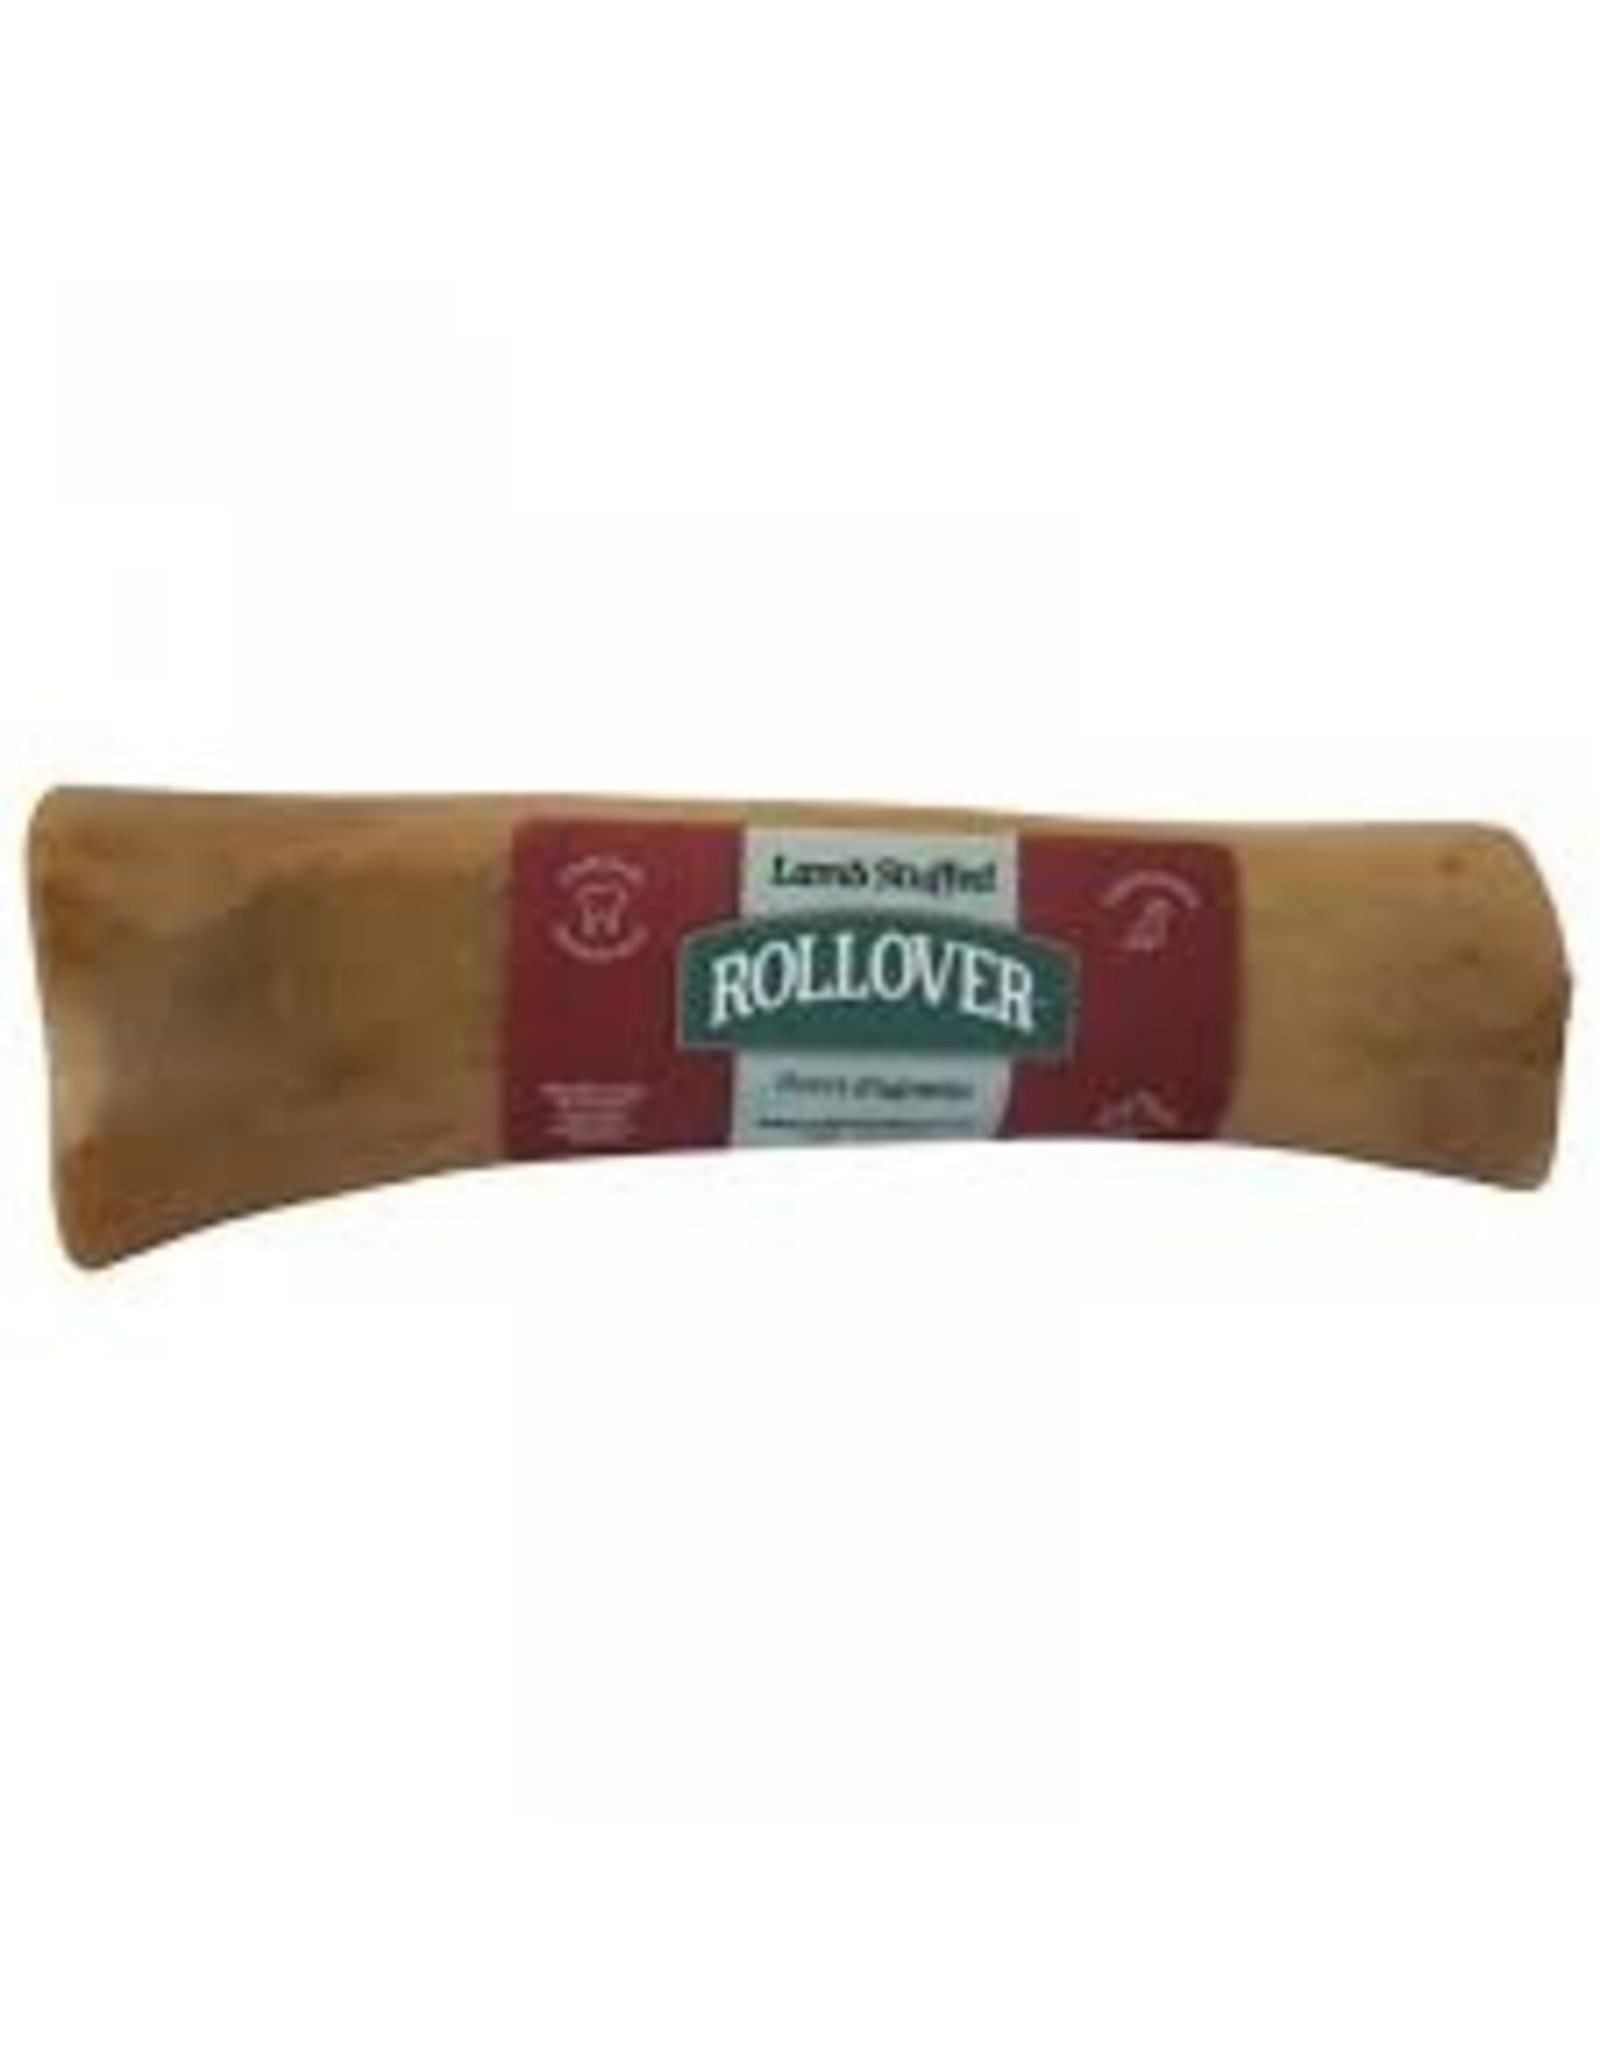 Rollover Large Stuffed Bone - Lamb